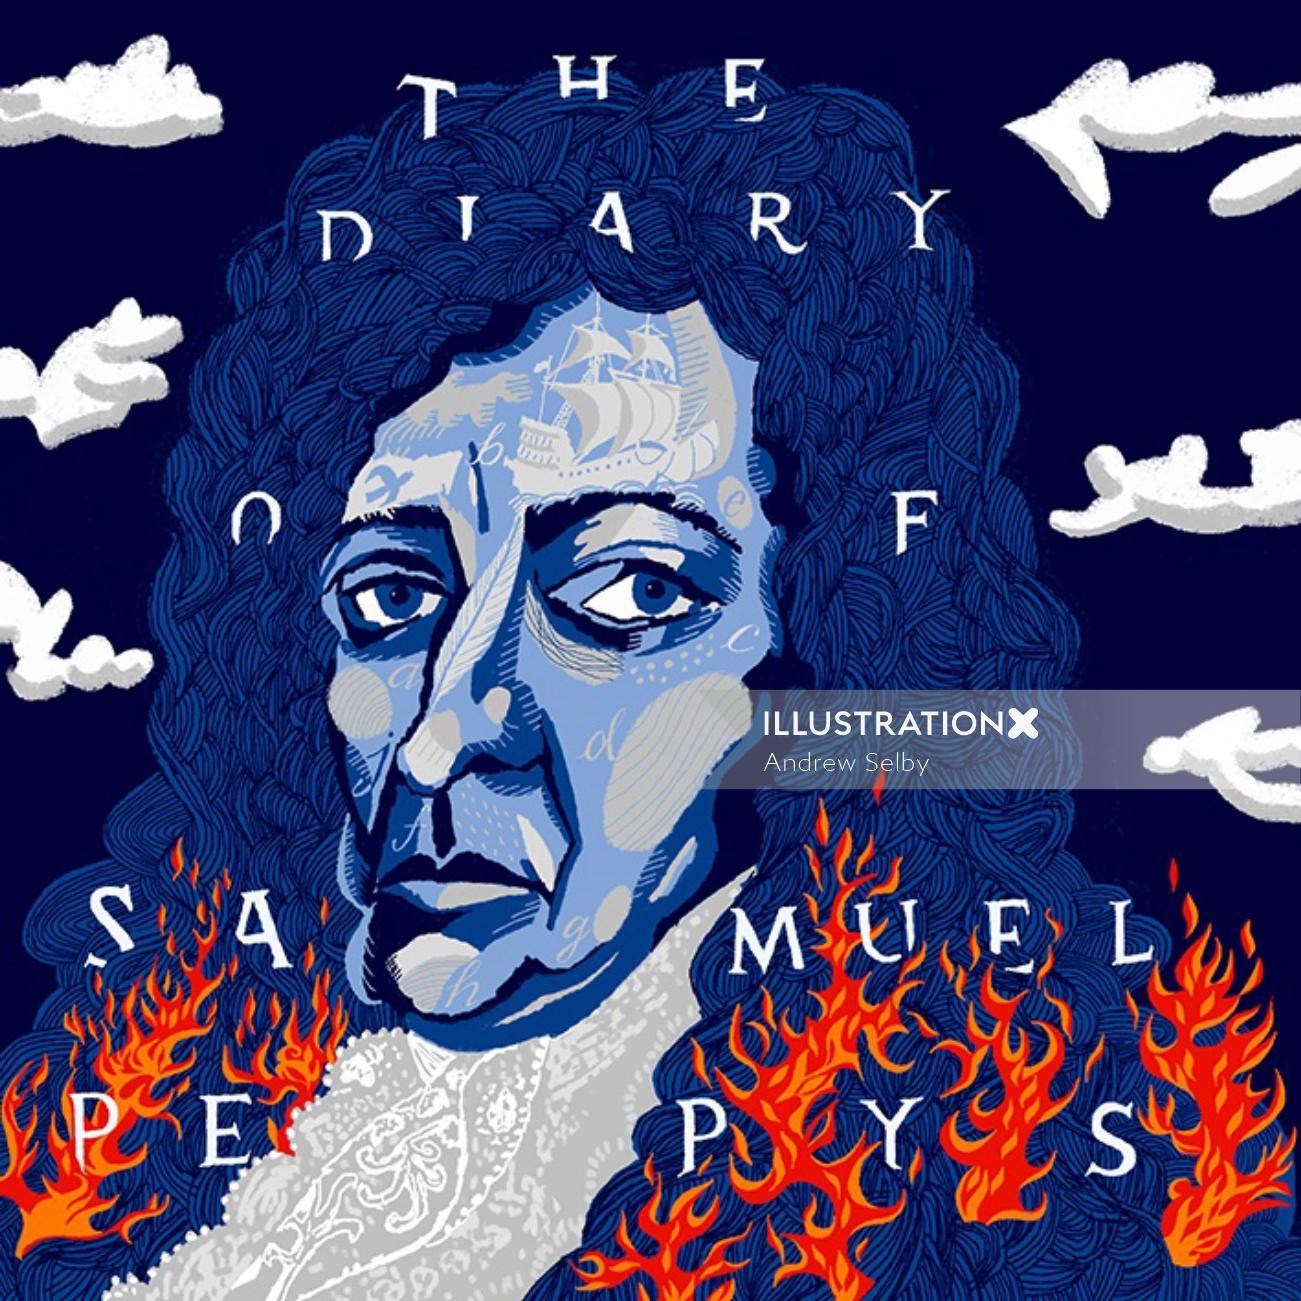 Samuel pepys diary cover